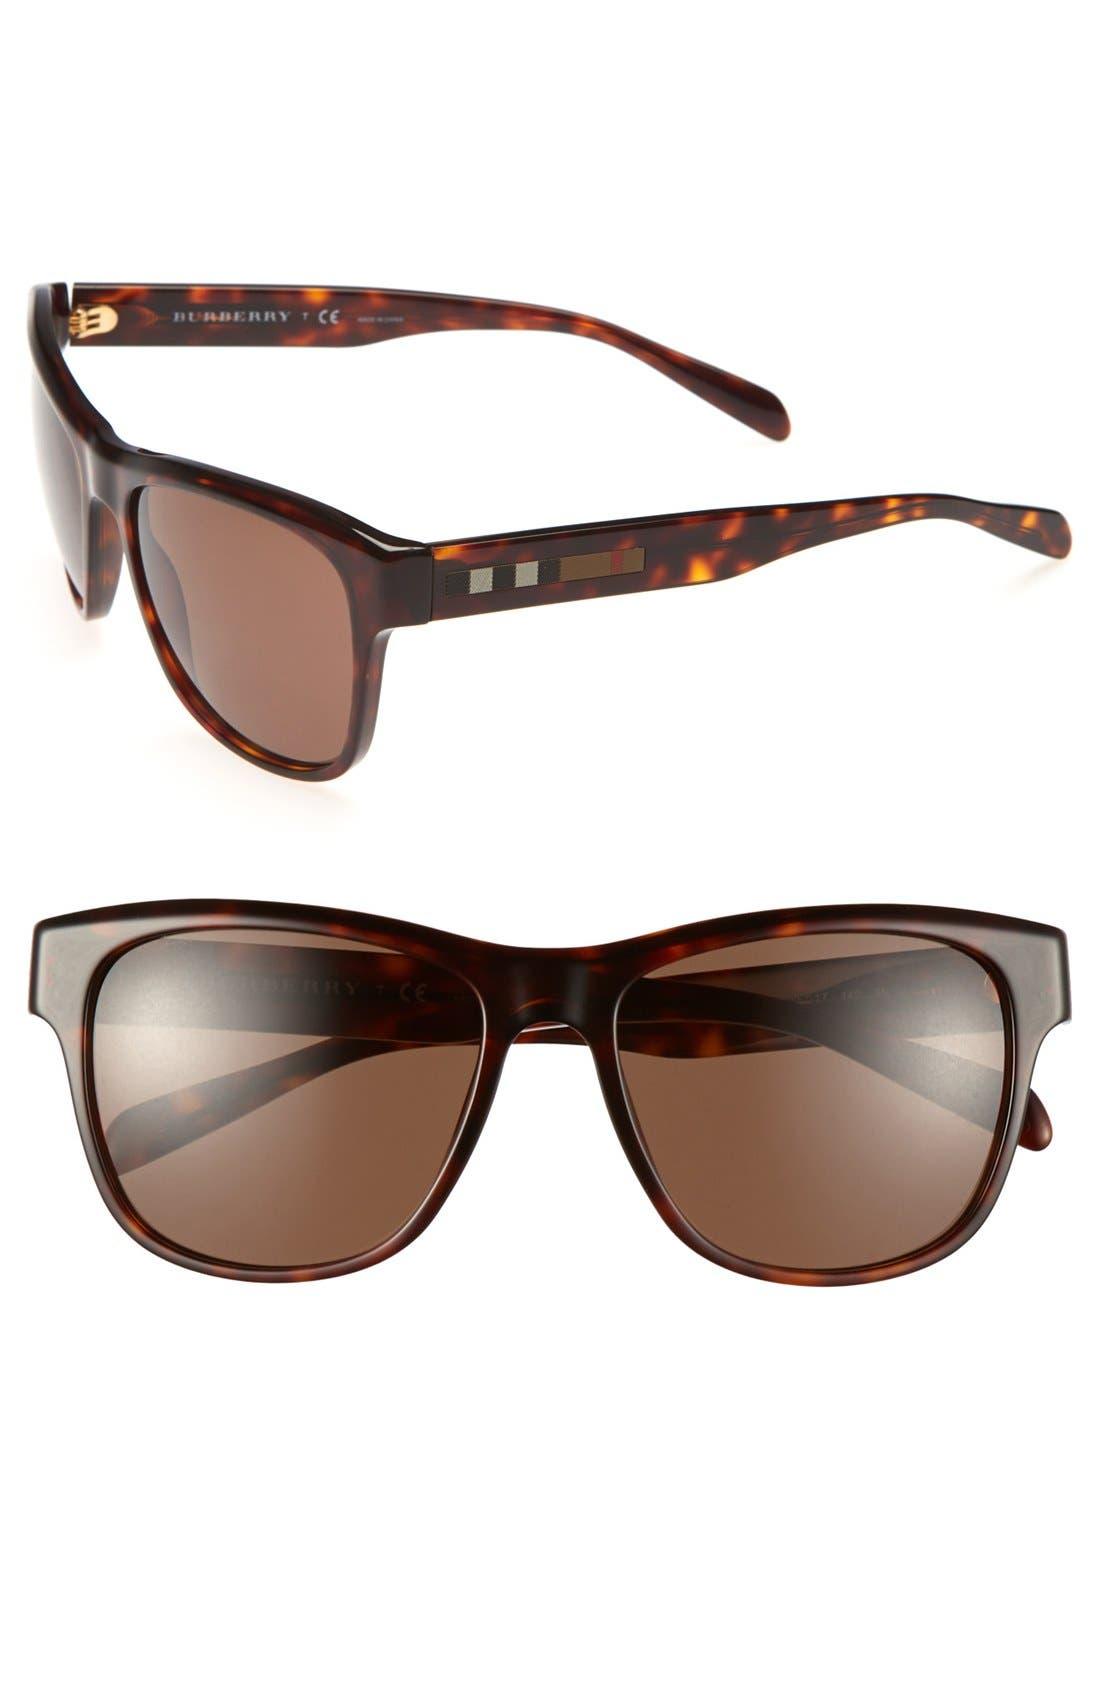 Alternate Image 1 Selected - Burberry 56mm Retro Sunglasses